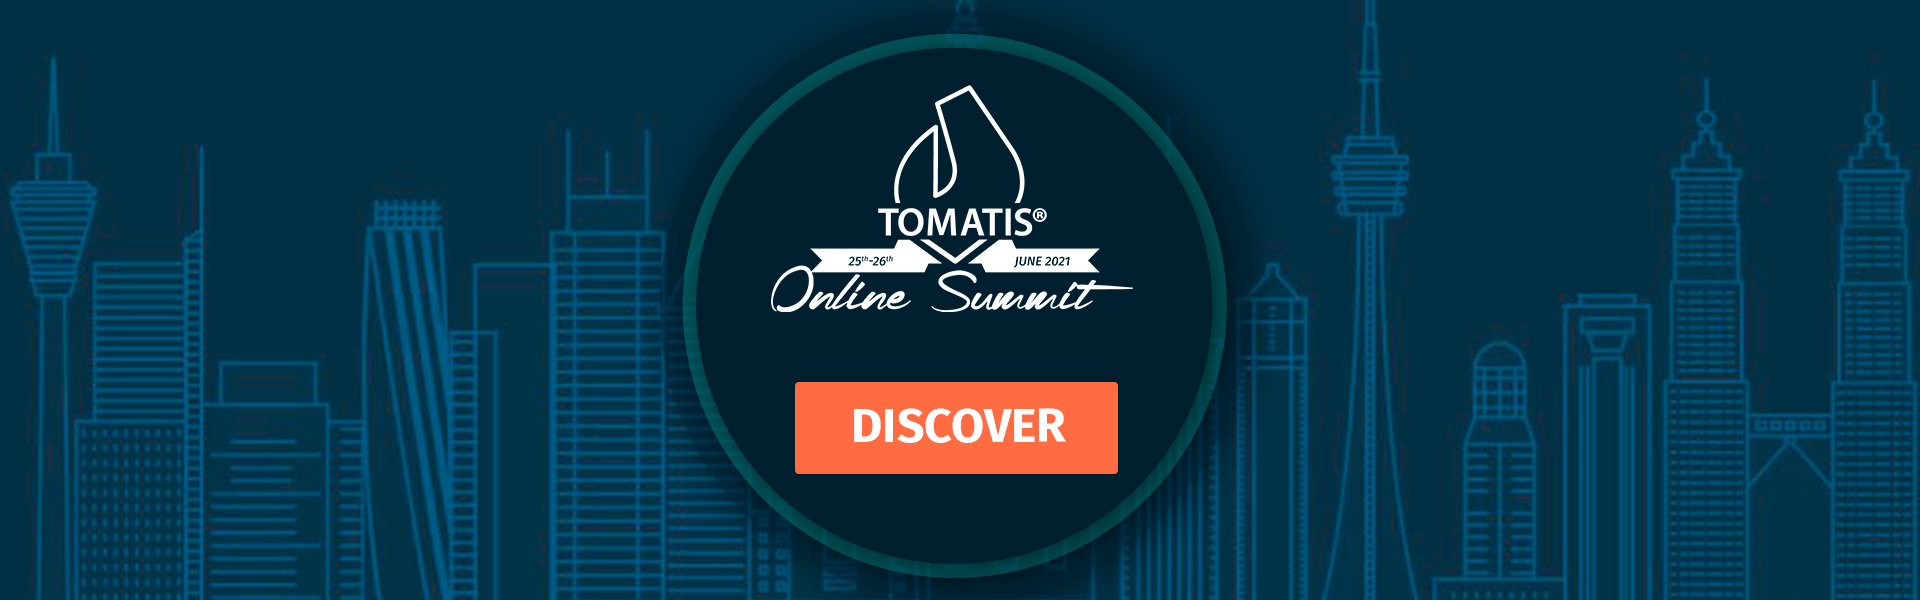 Online summit banner EN